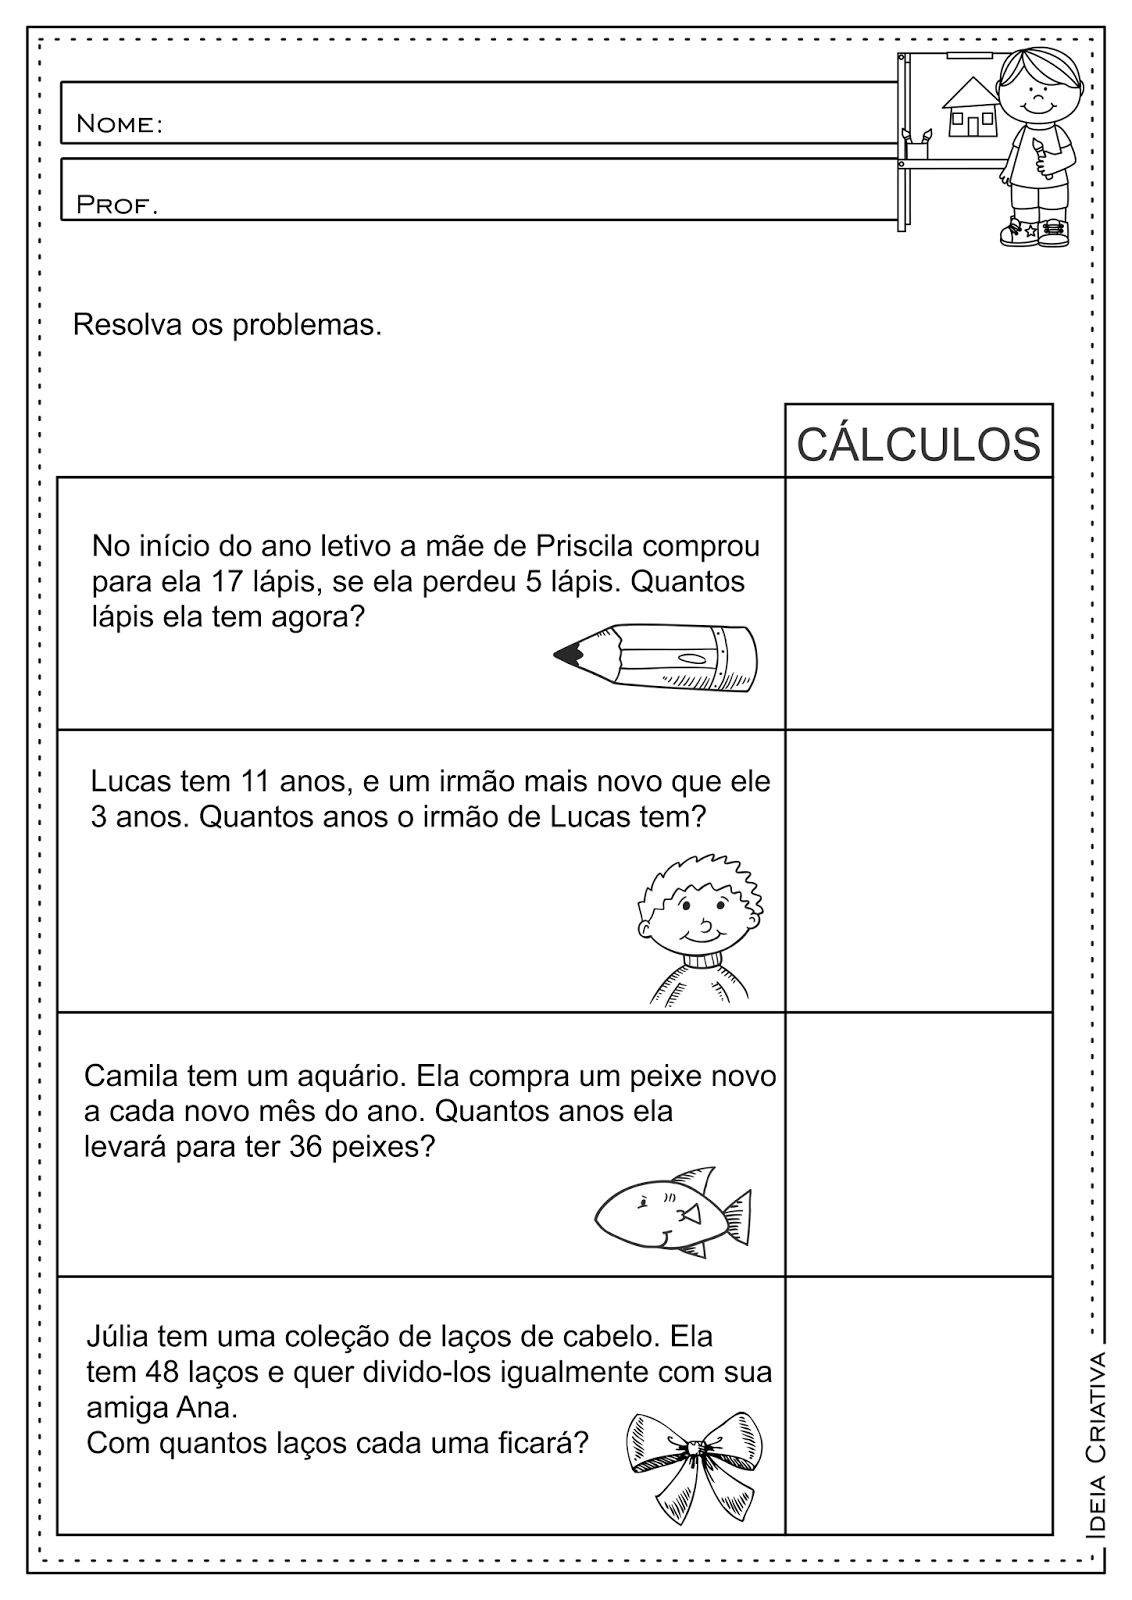 Ensino Fundamental Atividades E Projetos Educacionais Atividades Educativas Matematica Con Atividades De Matematica 3ano Matematica Simples Adicao E Subtracao